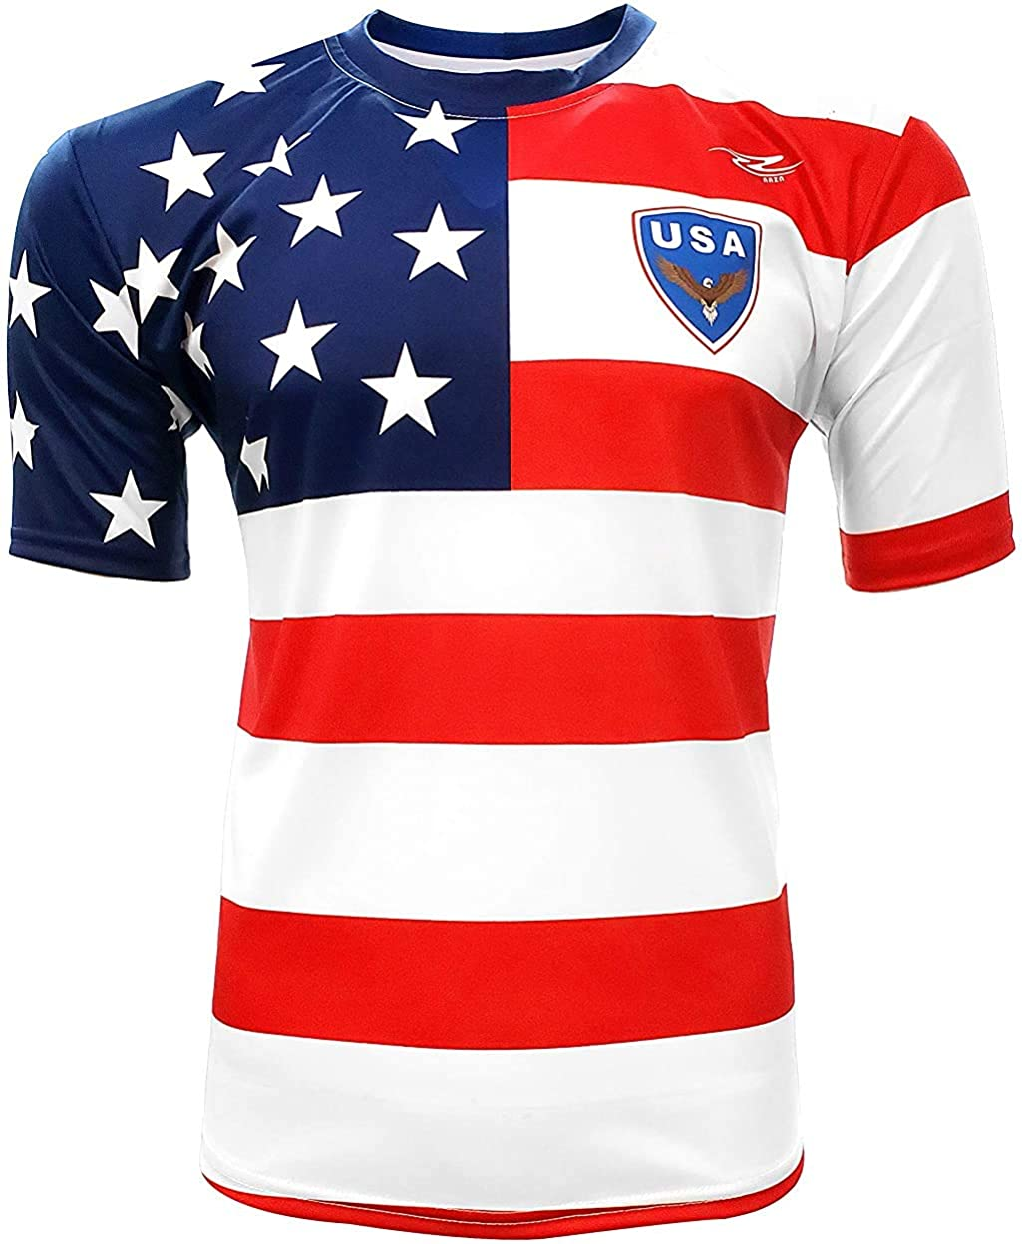 Men's USA Fan Jersey Arza Design Color White/Blue/Red